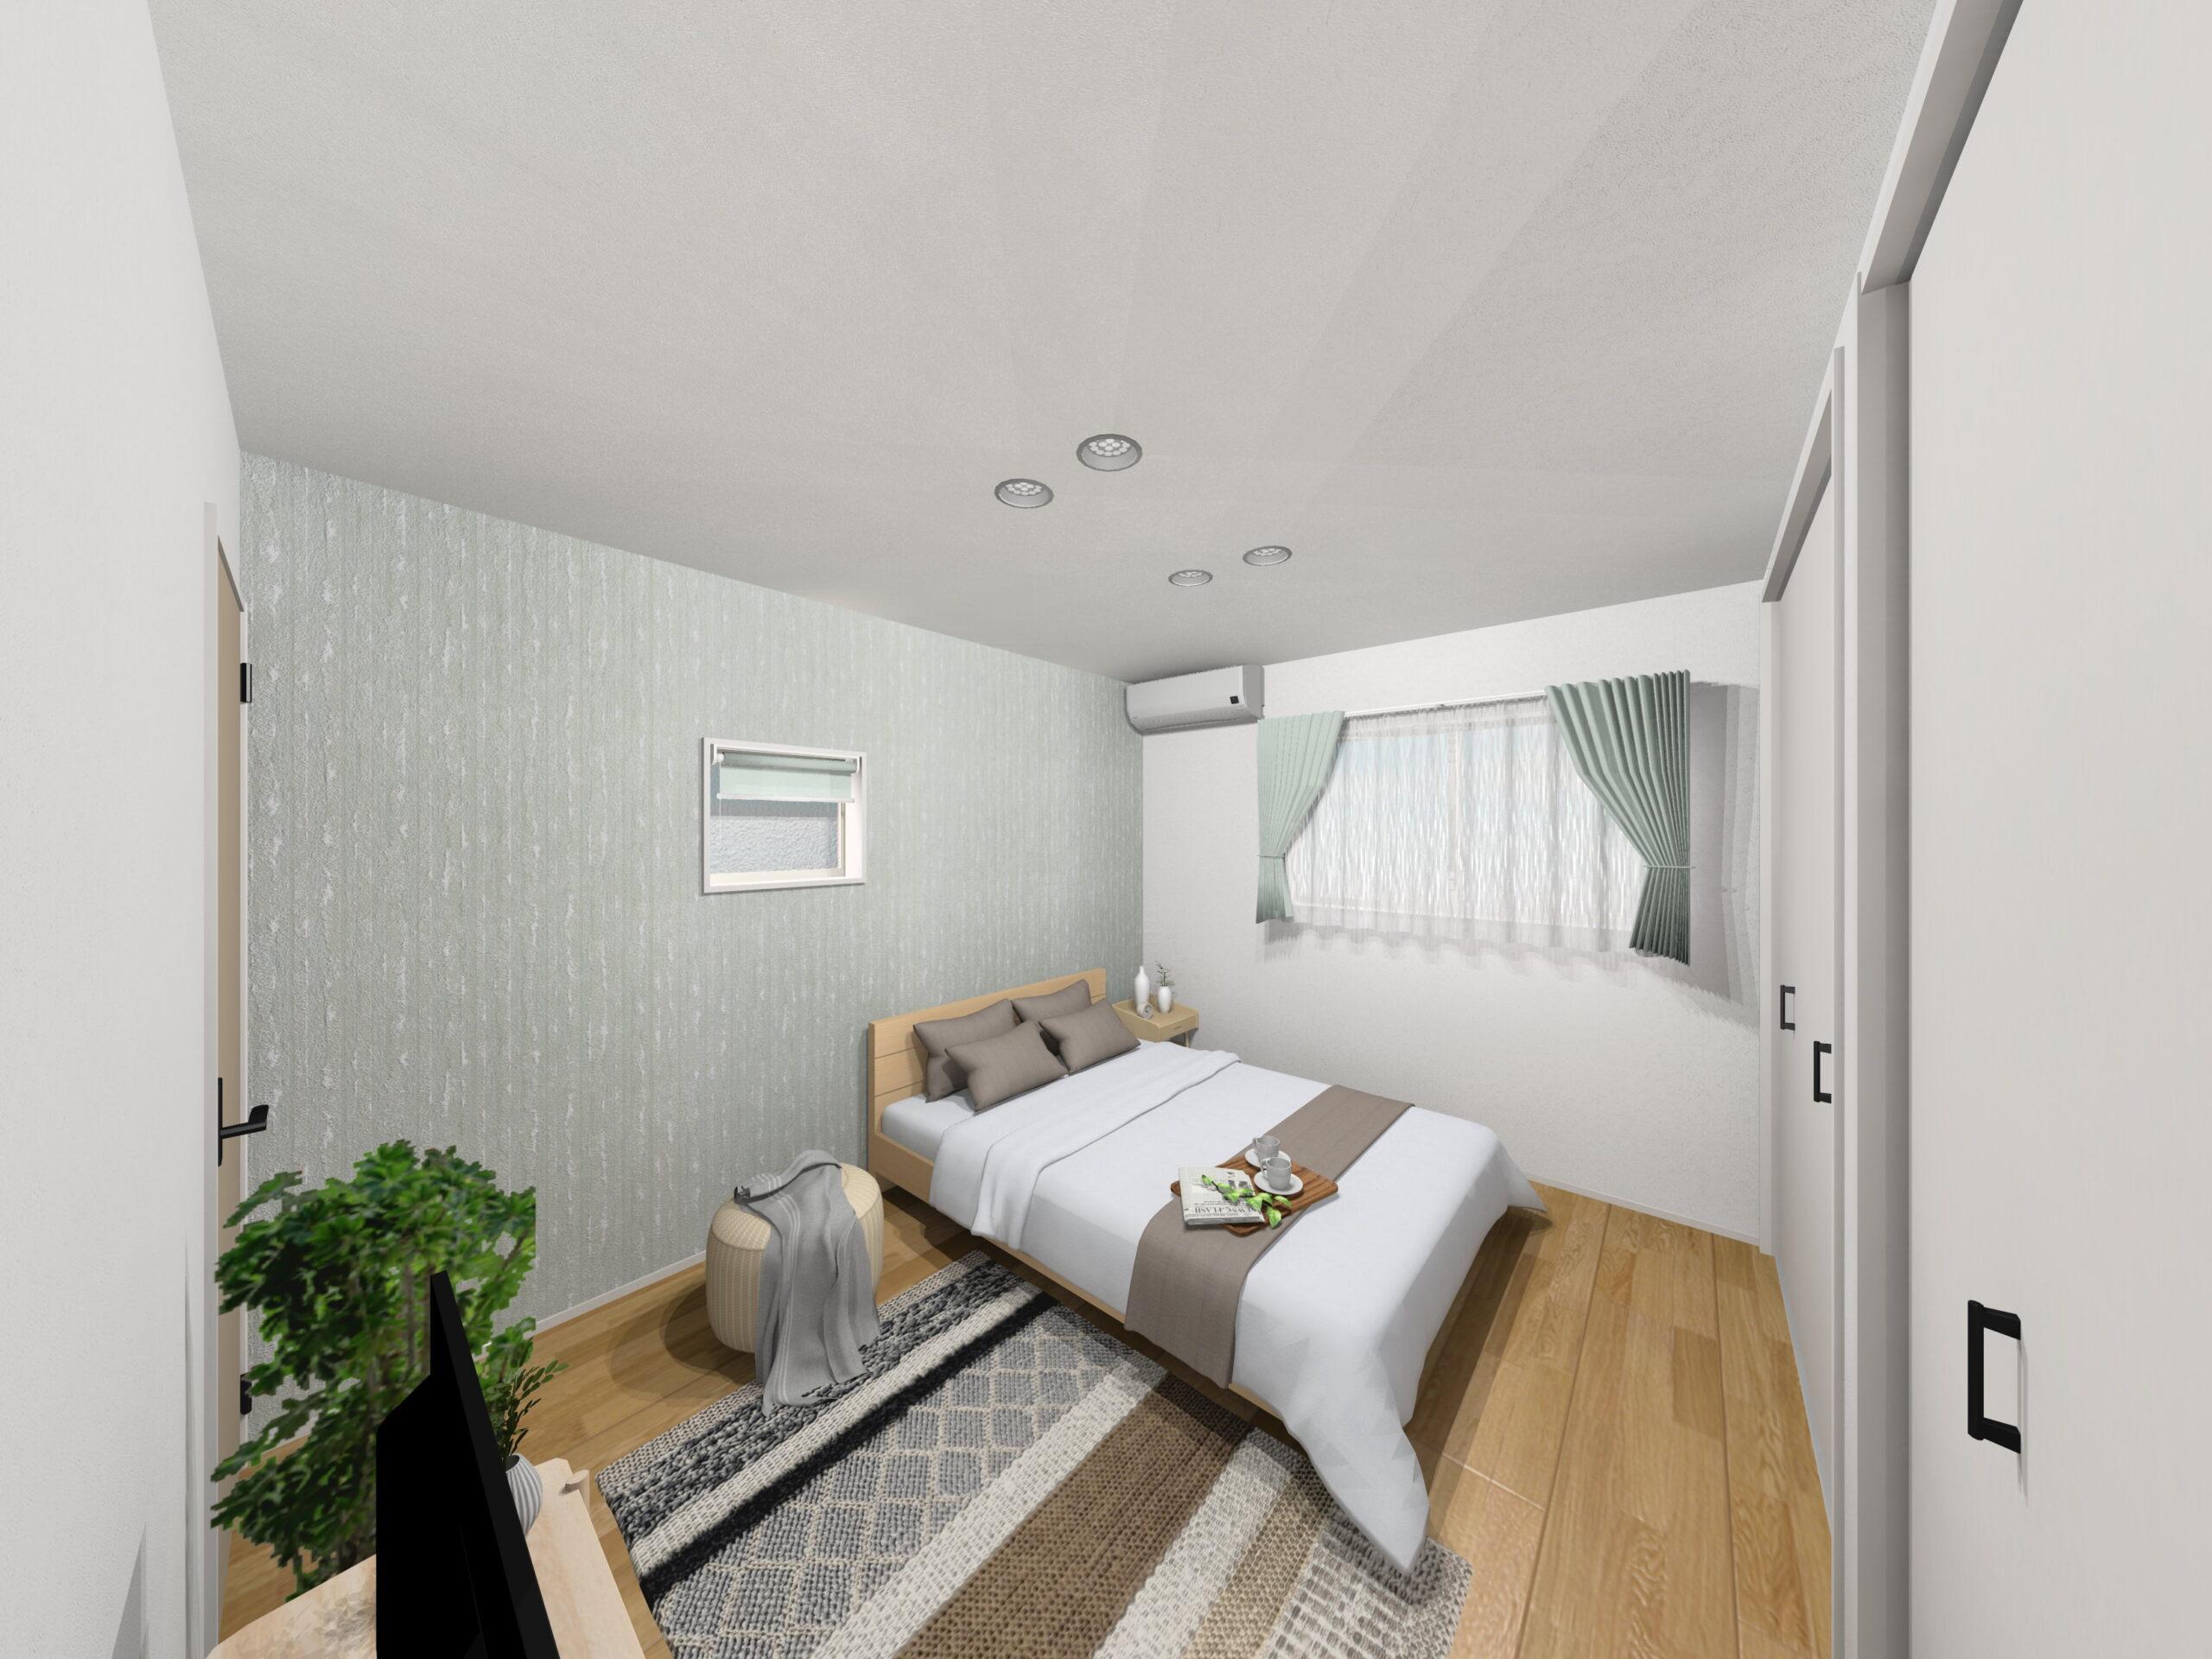 嬉野市新築建売住宅「OURS下宿」4号地主寝室パース